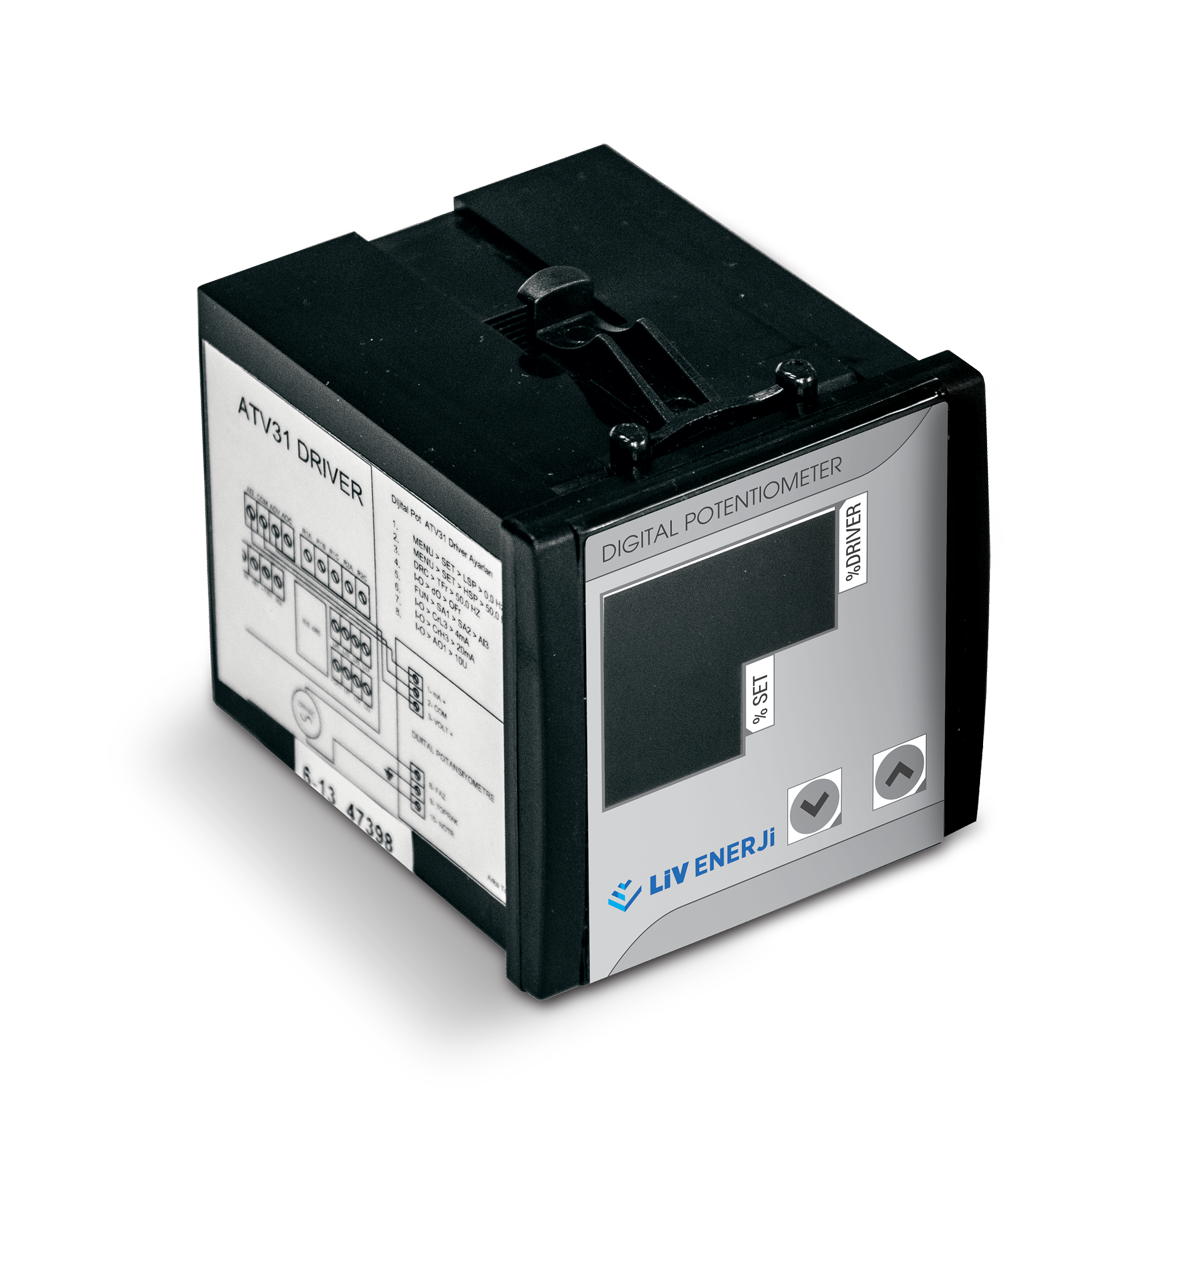 Double Probe Capacitive Sensor and Analog Converter17